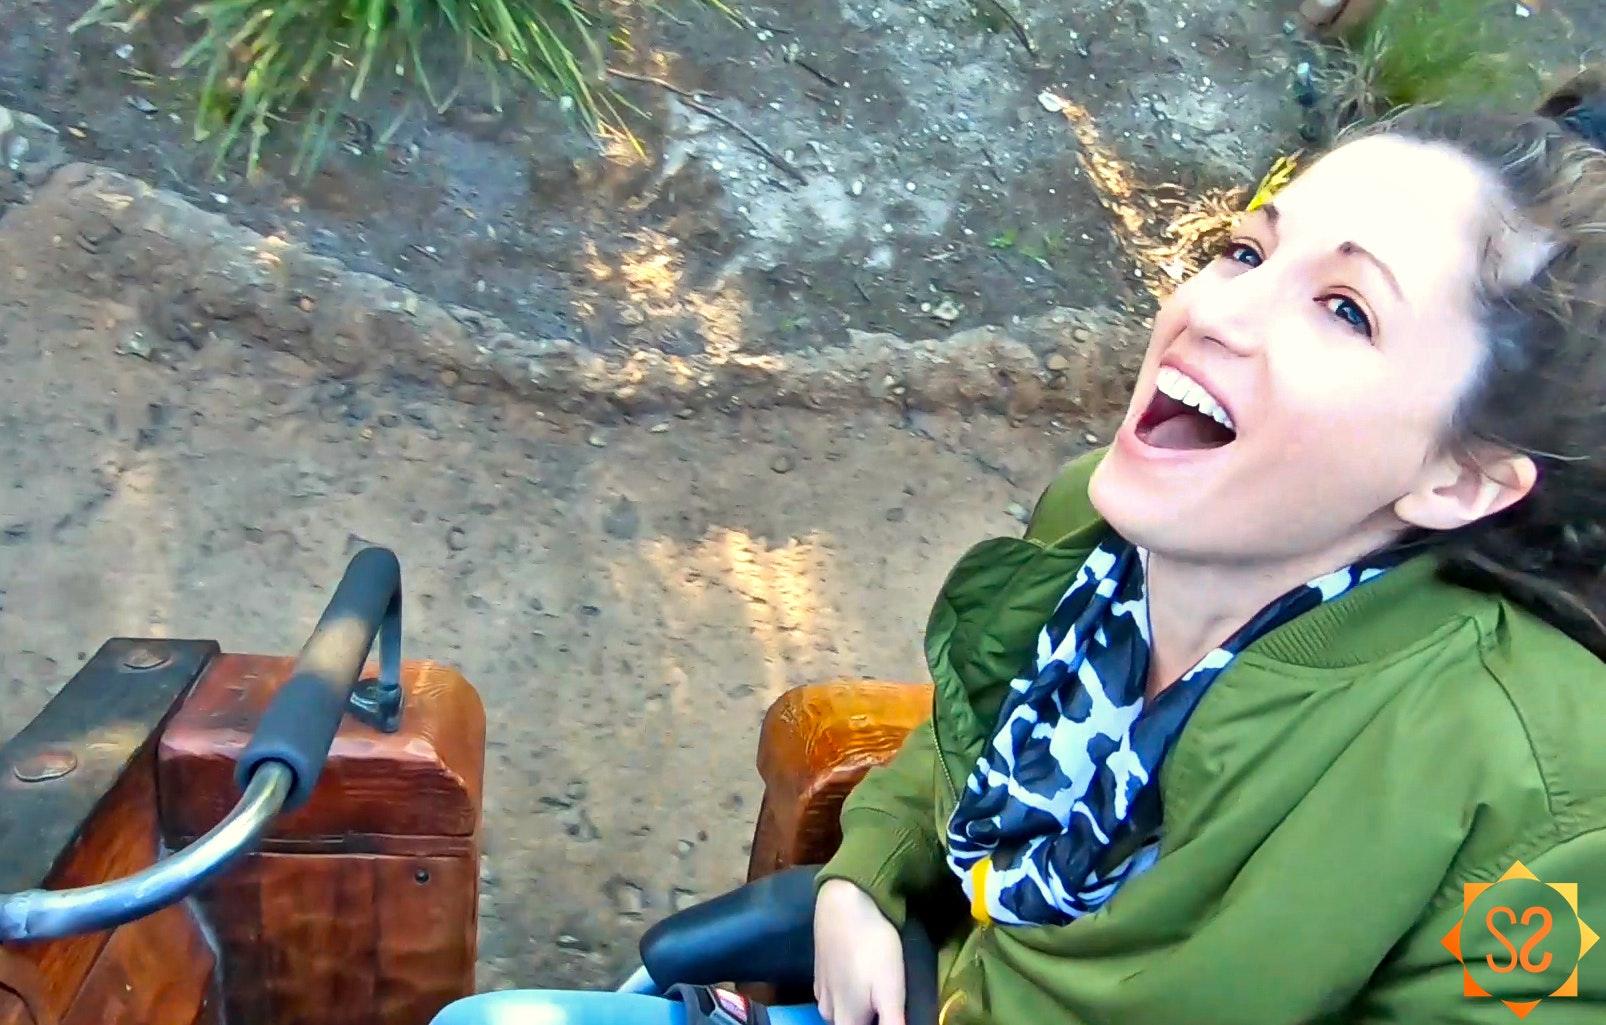 Laughing on Seven Dwarfs Mine Train